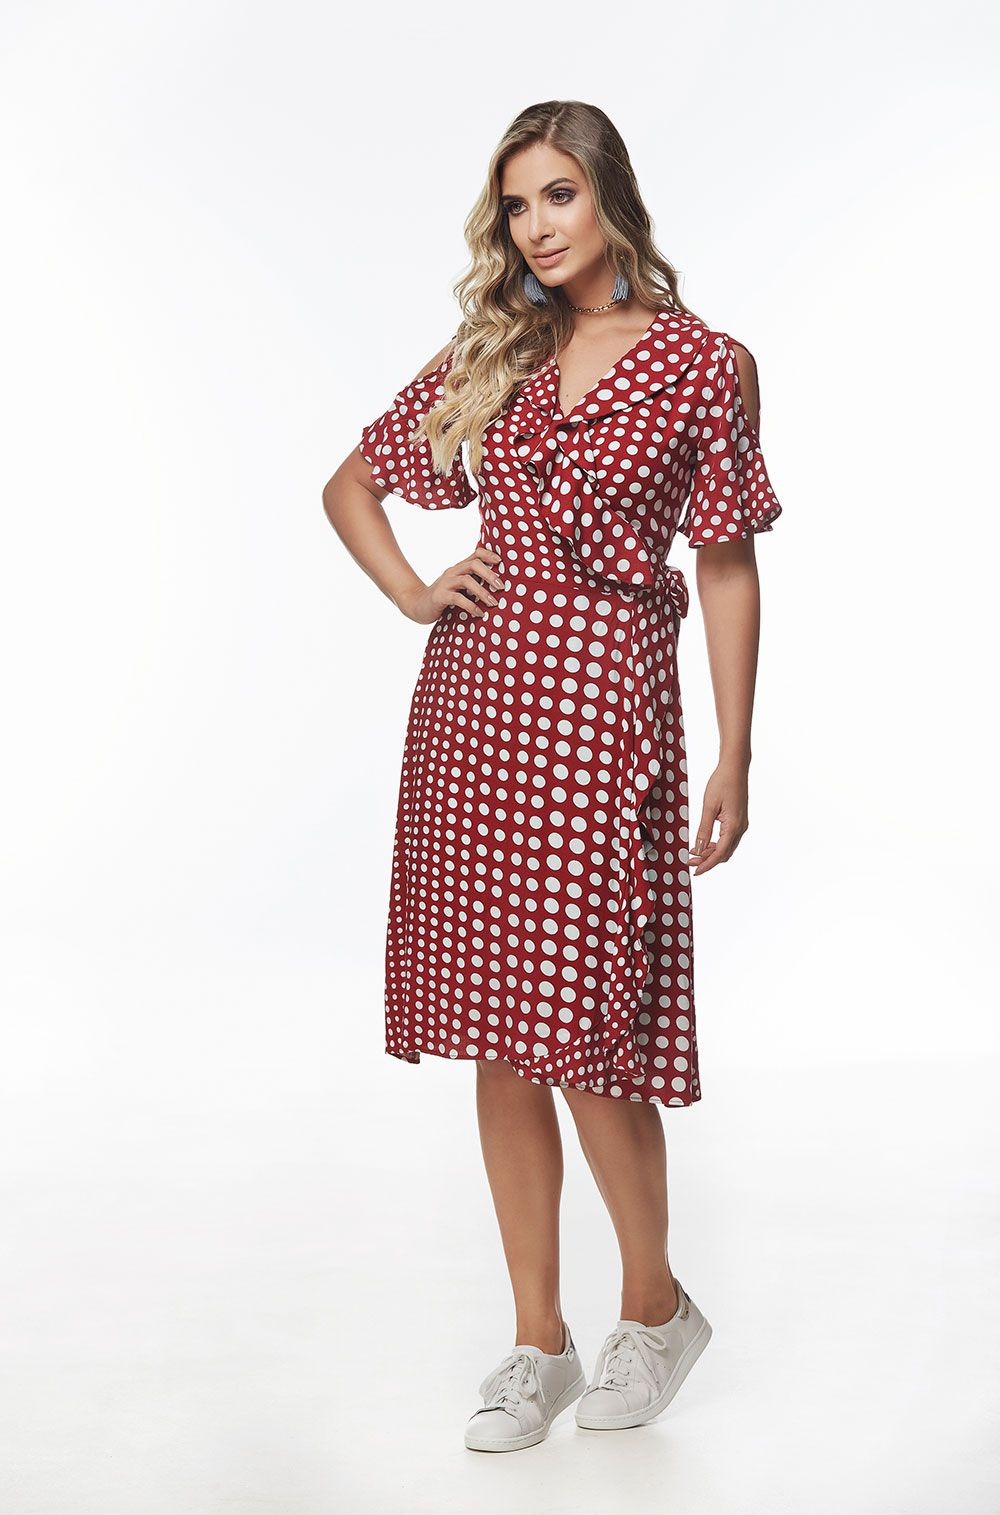 9f0310b8f Vestido Chanel Poá Vermelho - VANKOKE - Moda Feminina - Vestidos ...